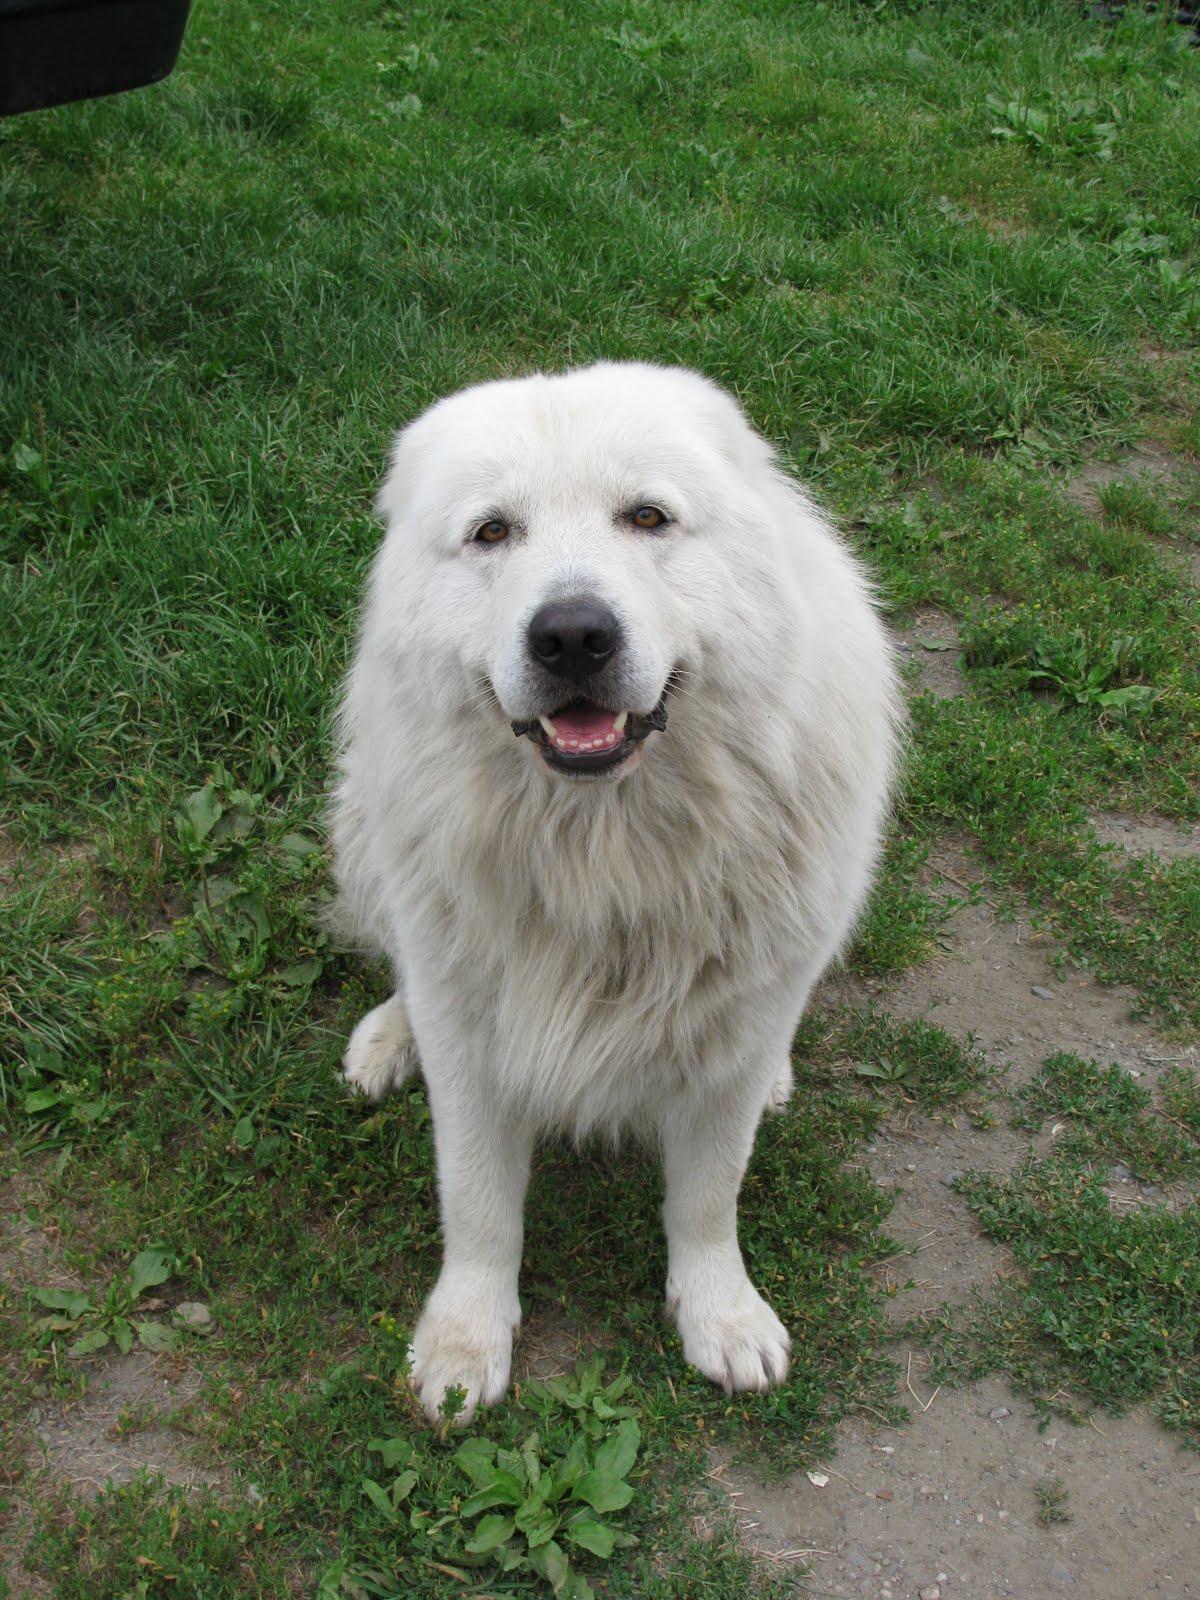 Breed Of Dog That Looks Like A Polar Bear Looks like a polar bear White Dog That Looks Like A Polar Bear